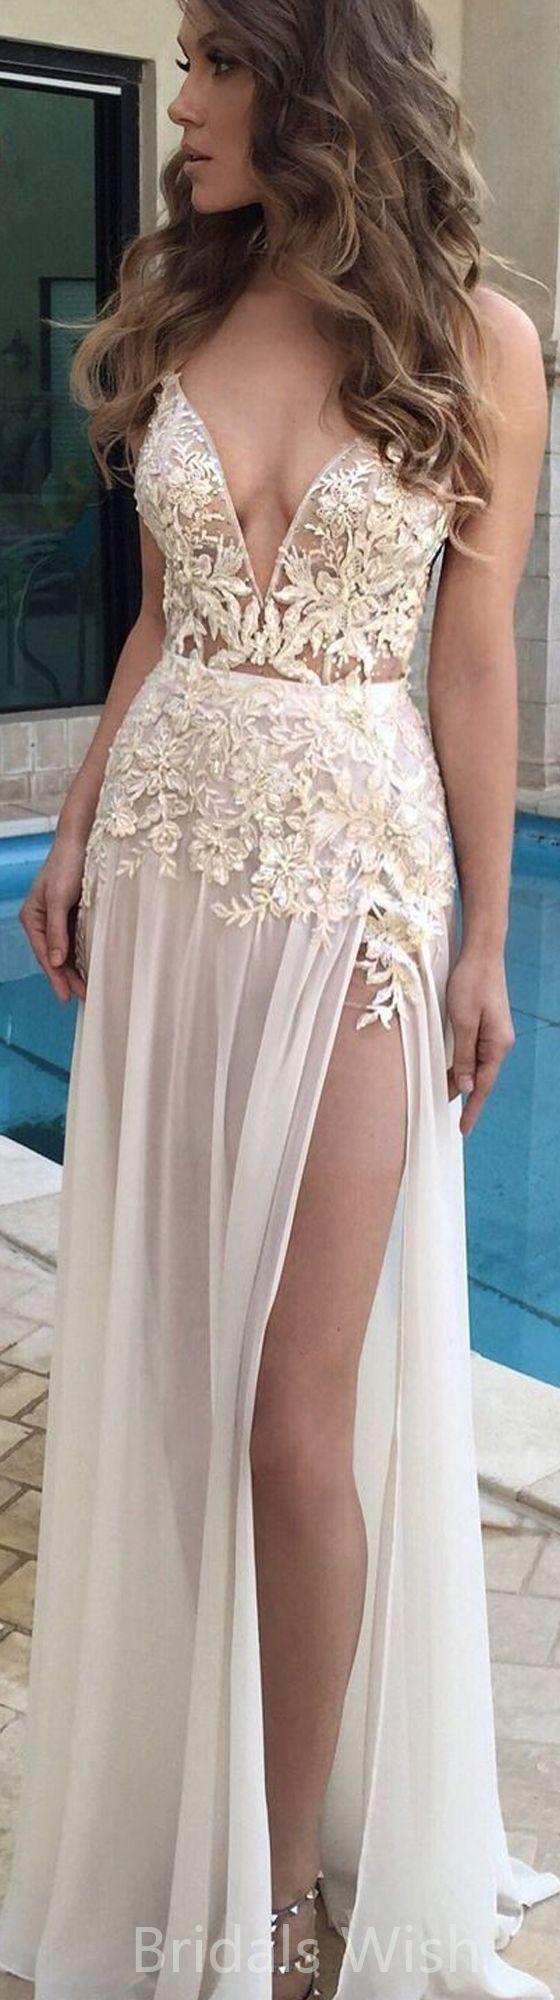 Elegant long prom dresses lace top long prom dressesdeep vneck